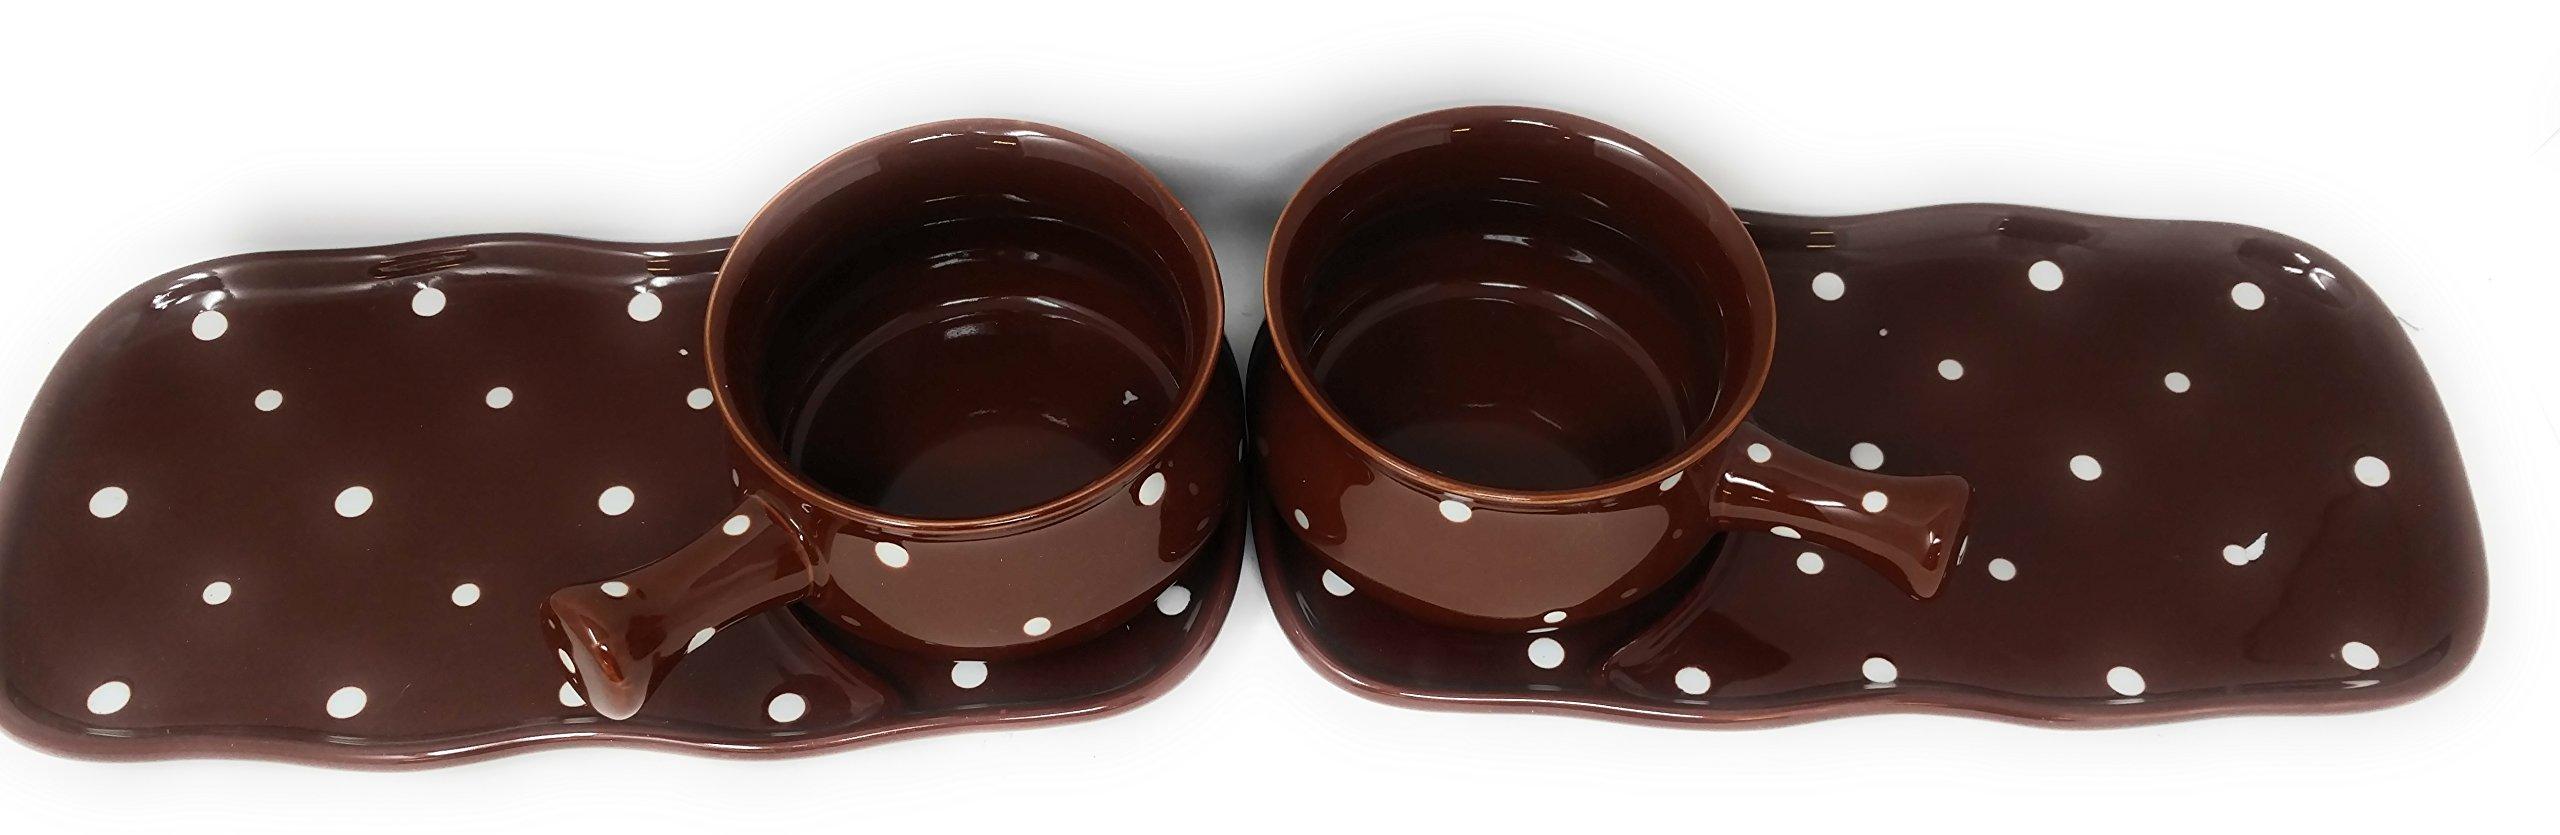 Temp-tations Soup & Sandwich Set - 4pc (Polka Dot Chocolate)